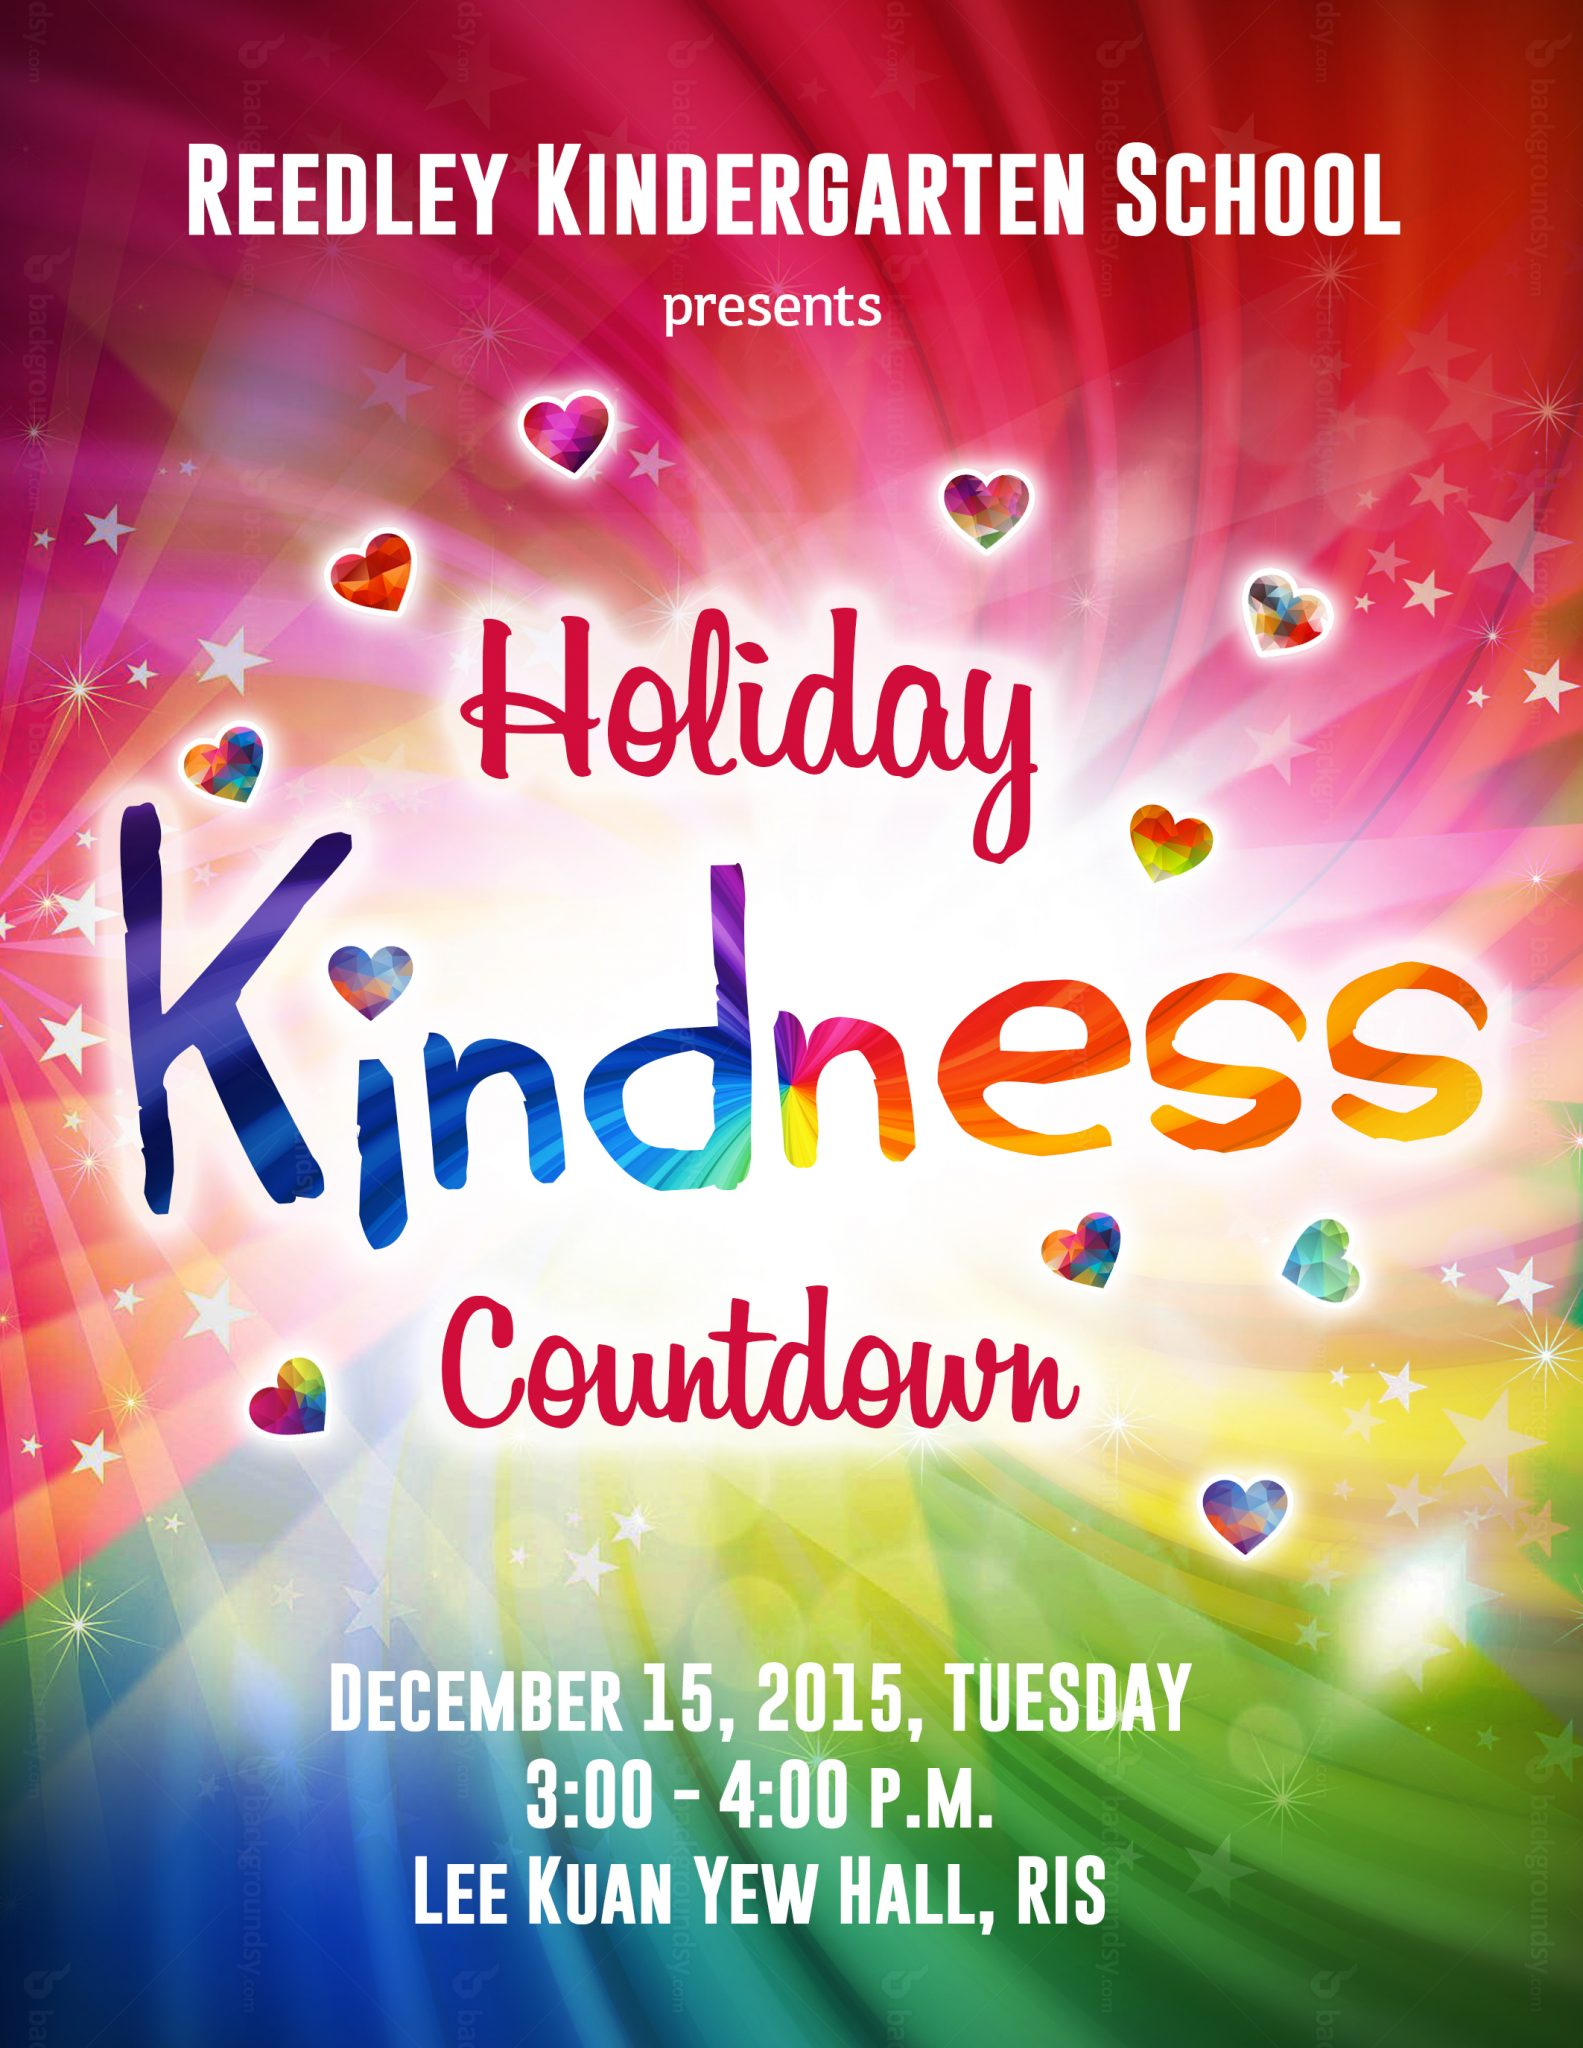 kindergarten kindness RIS